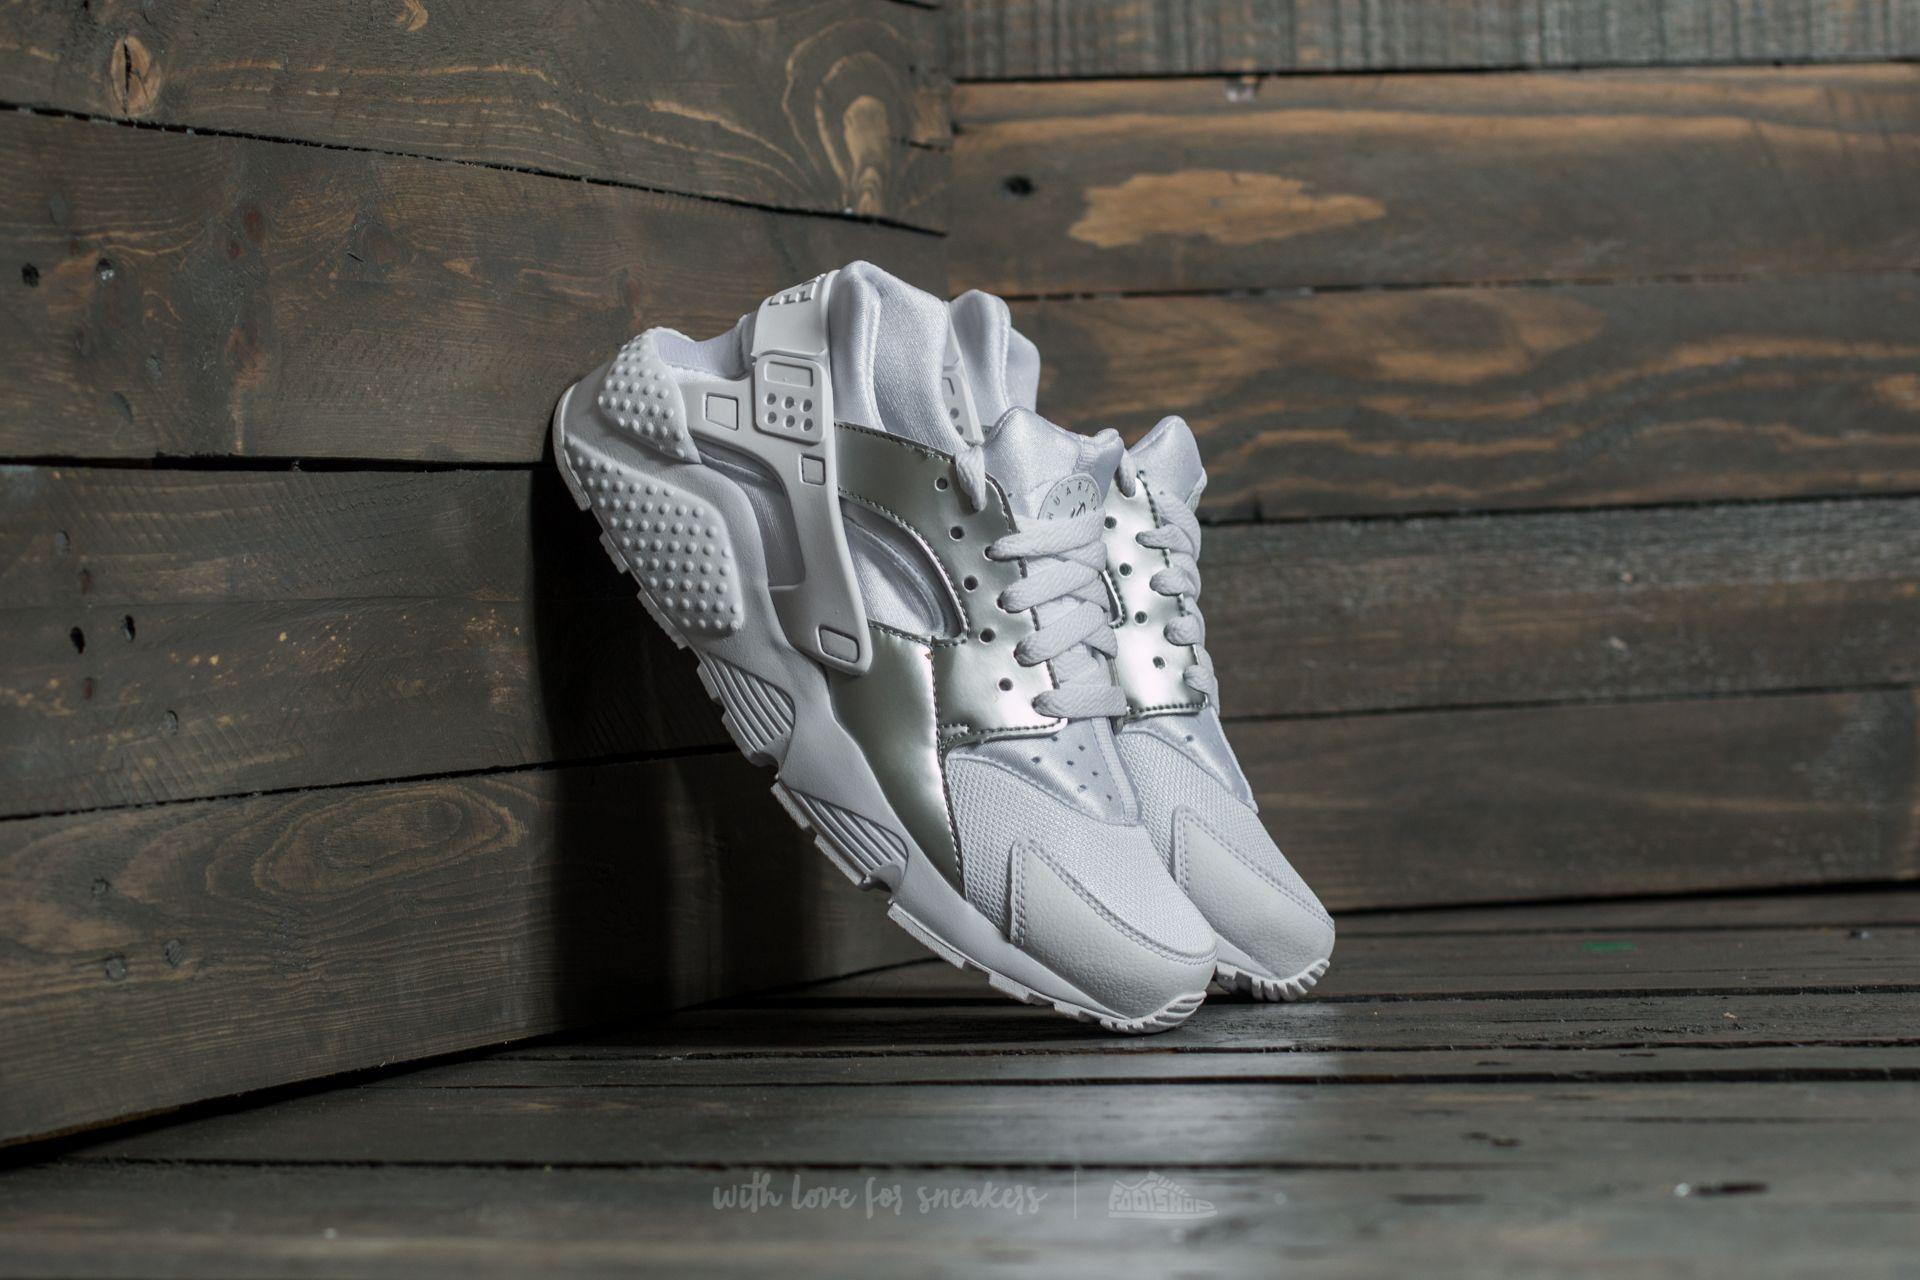 Nike Huarache Run (GS) White/ Metallic Silver - 16106